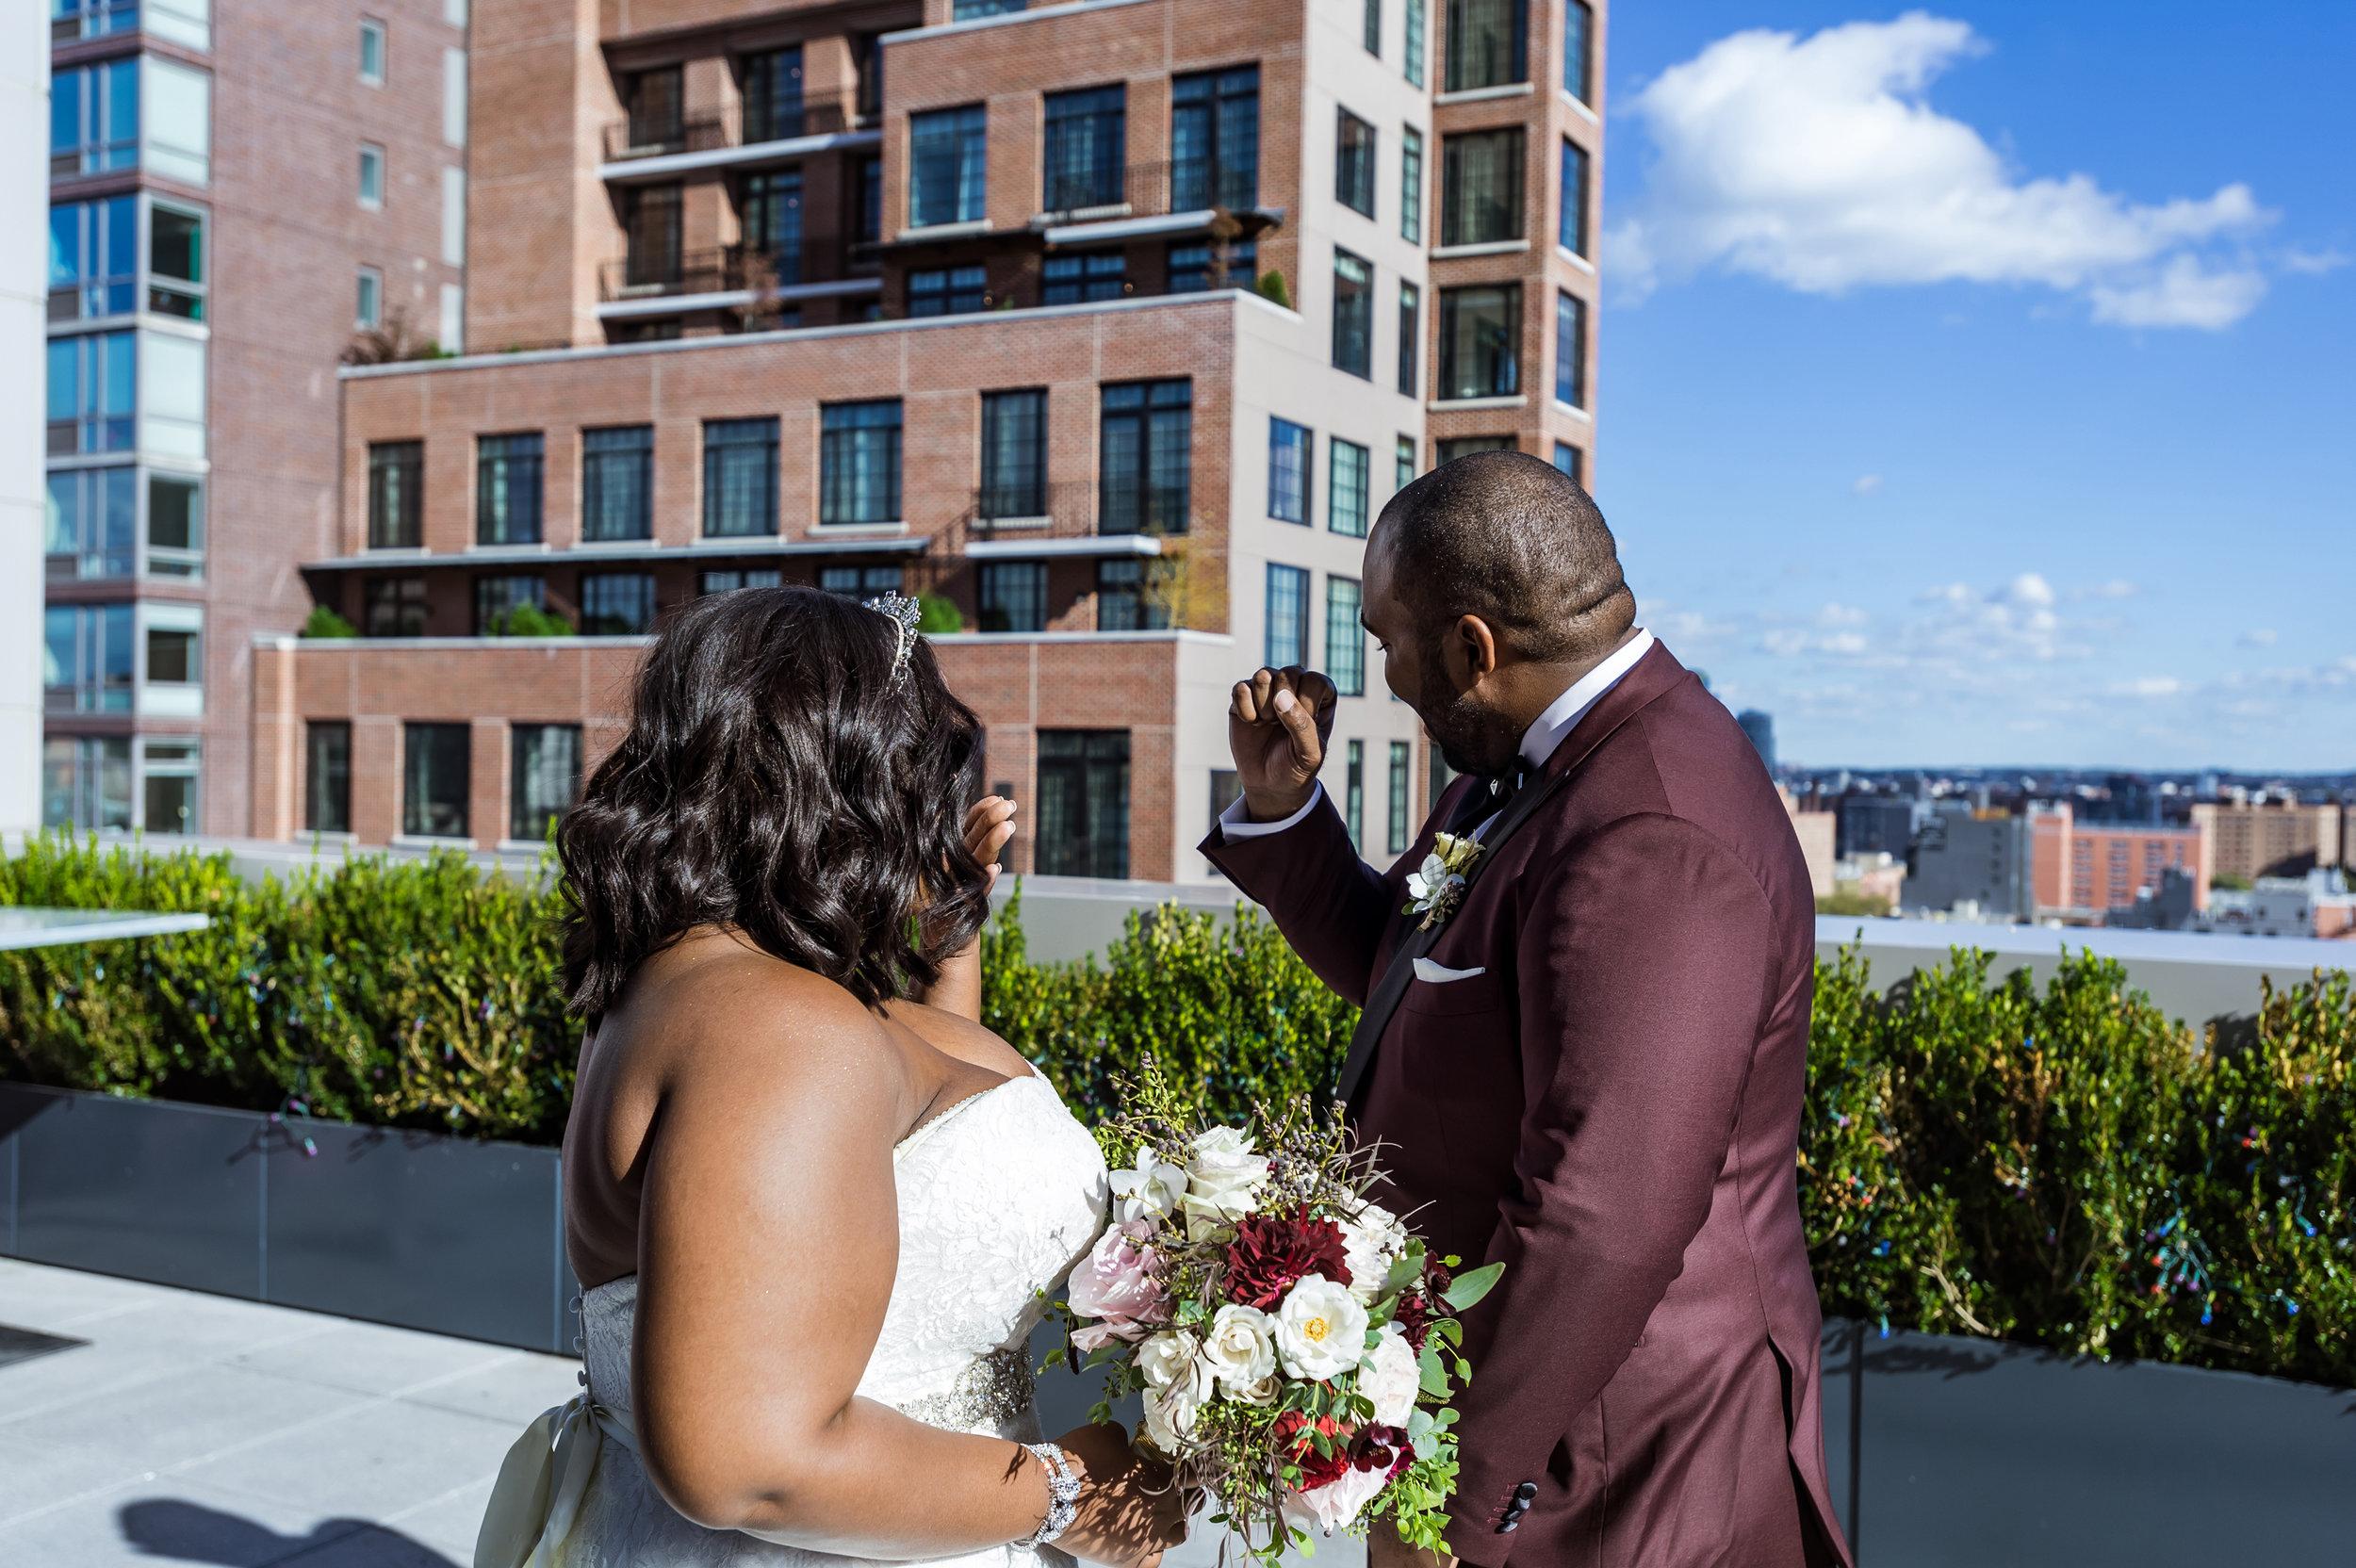 victorious-events-nyc-023-yanique-rondel-greenpoint-loft-wedding-amy-anaiz.jpg